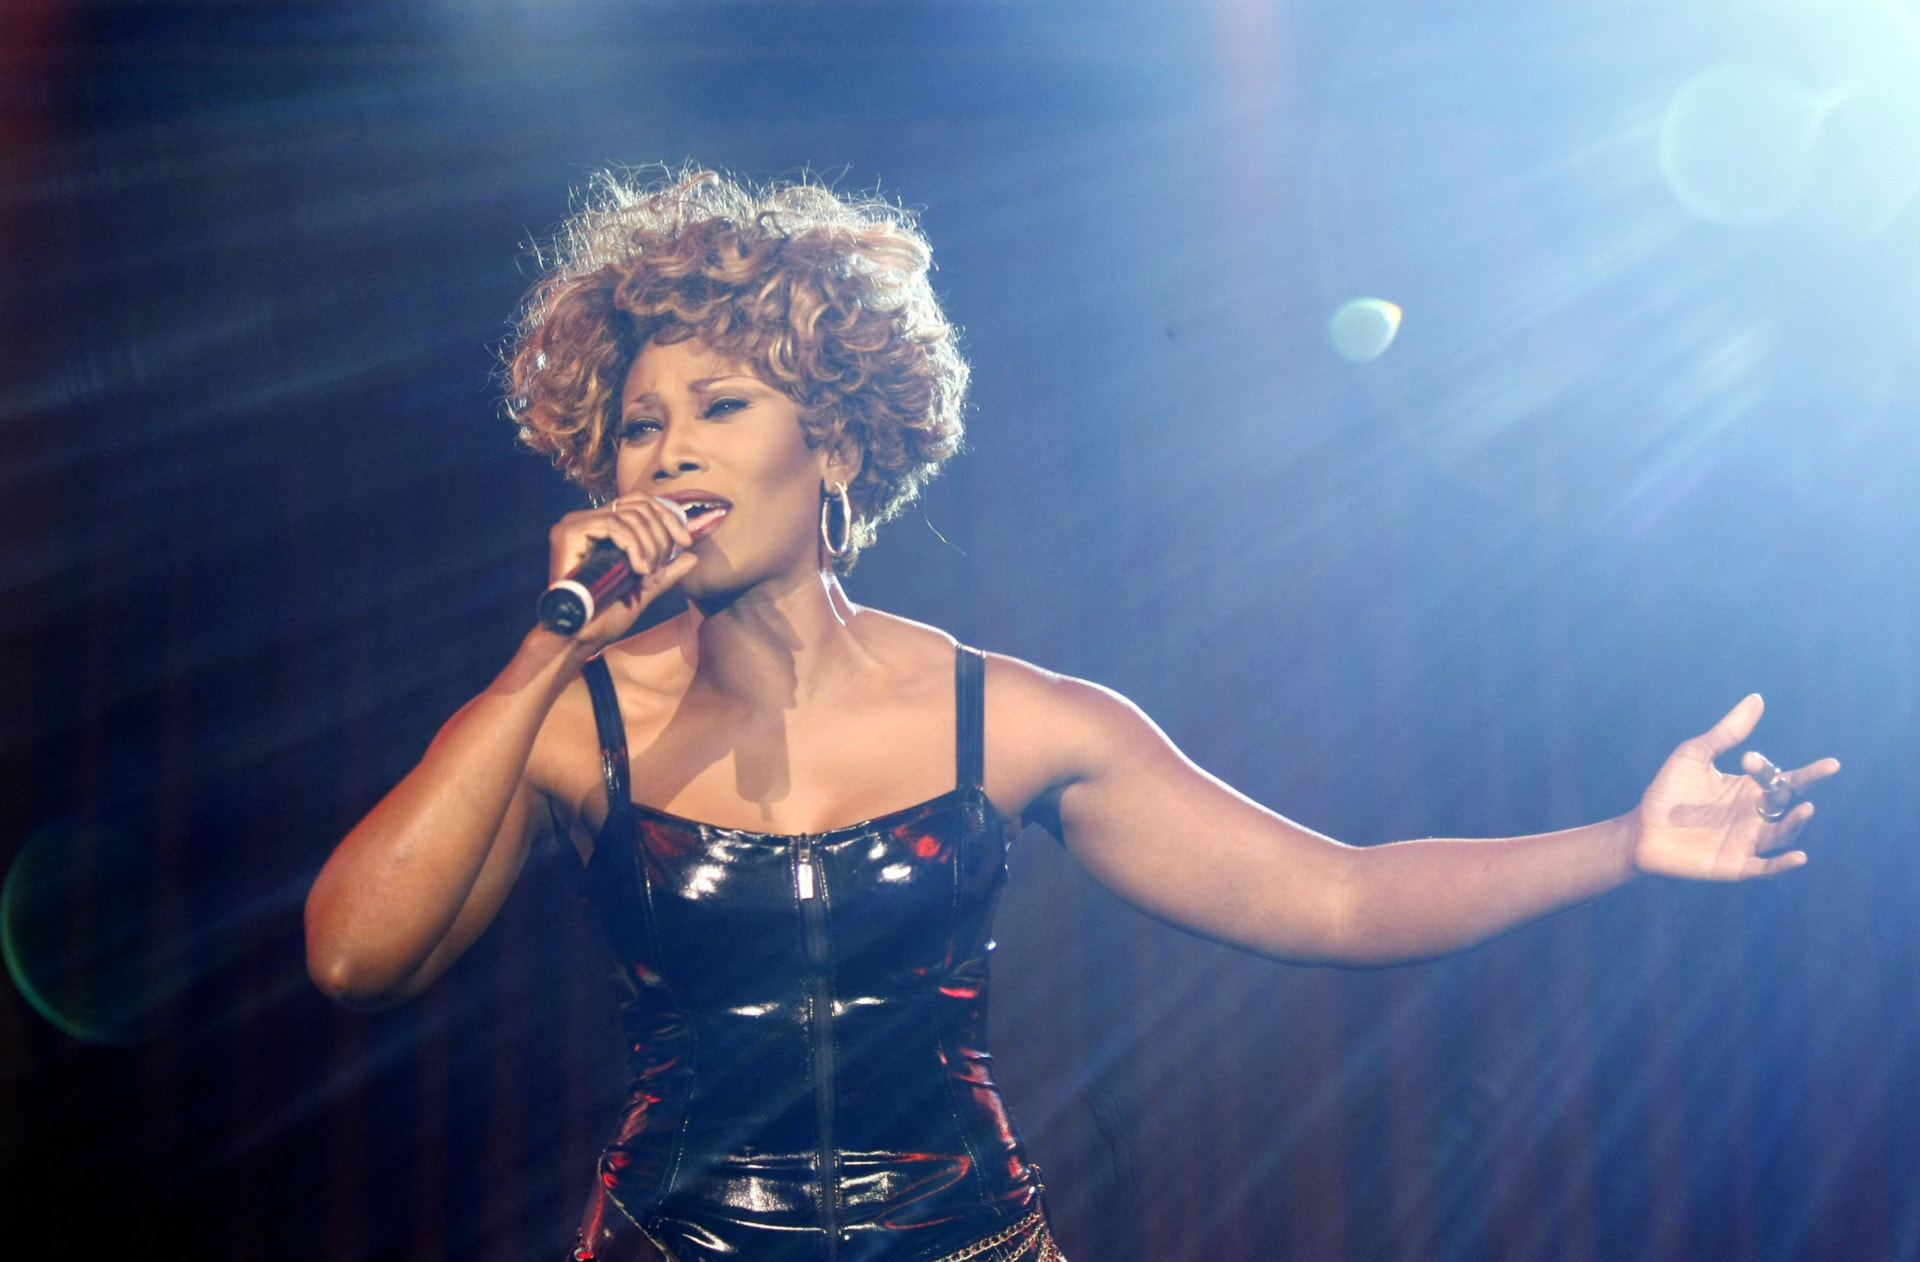 o 02 pressebild simply the best c davids darmerjpg 1567095662 scaled - OXMOX verlost Tickets: Simply The Best – Die Tina Turner Story (27.12.)